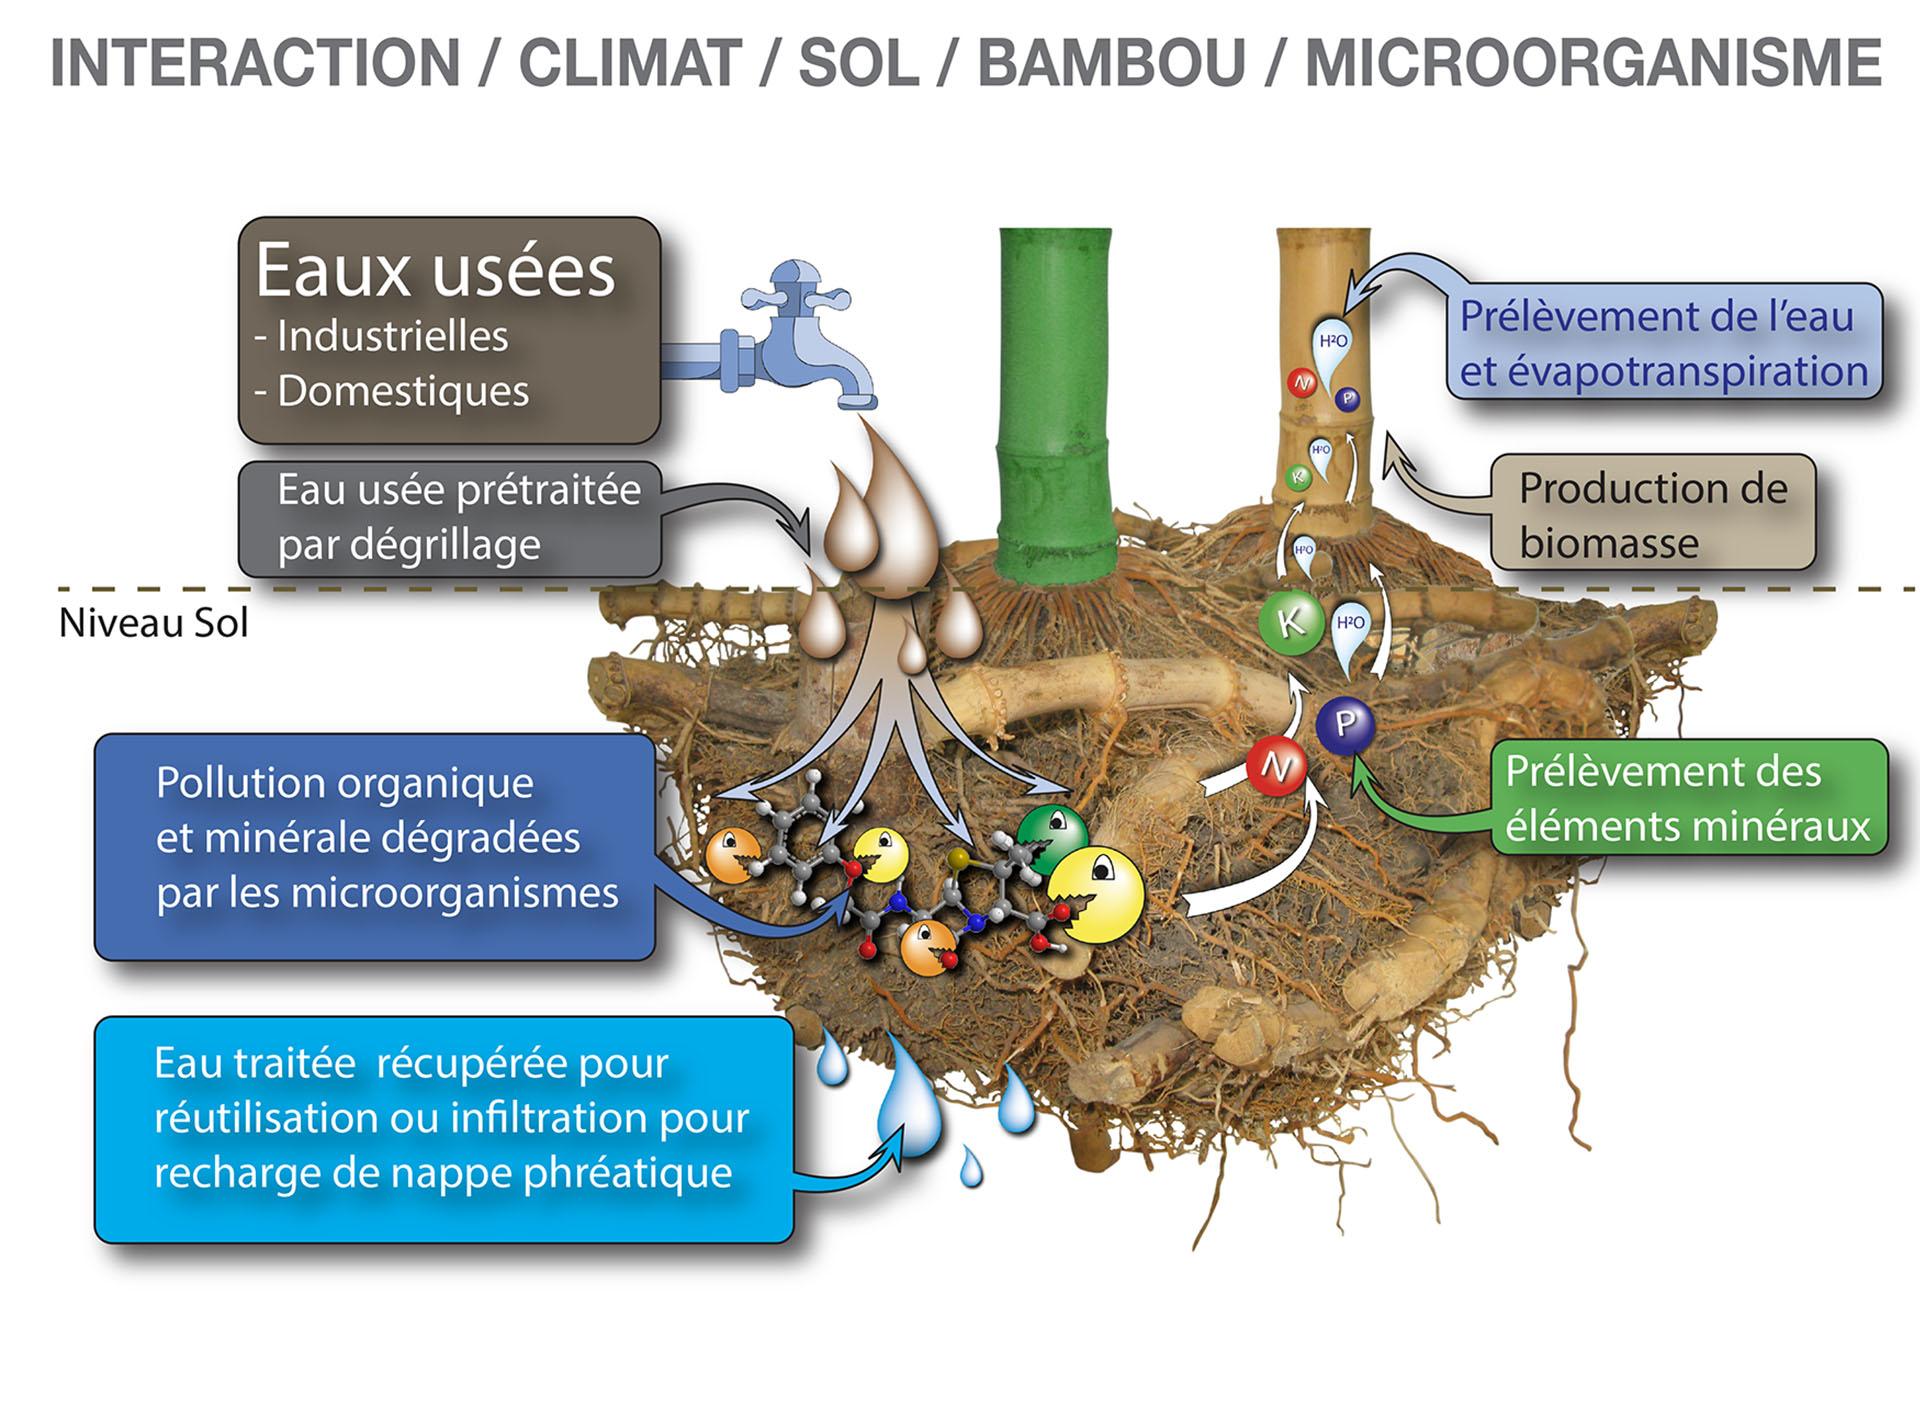 comment-ca-marche-fonctionnement-technologie-bambou-assainissement-procede-bambou-bamboo-for-life